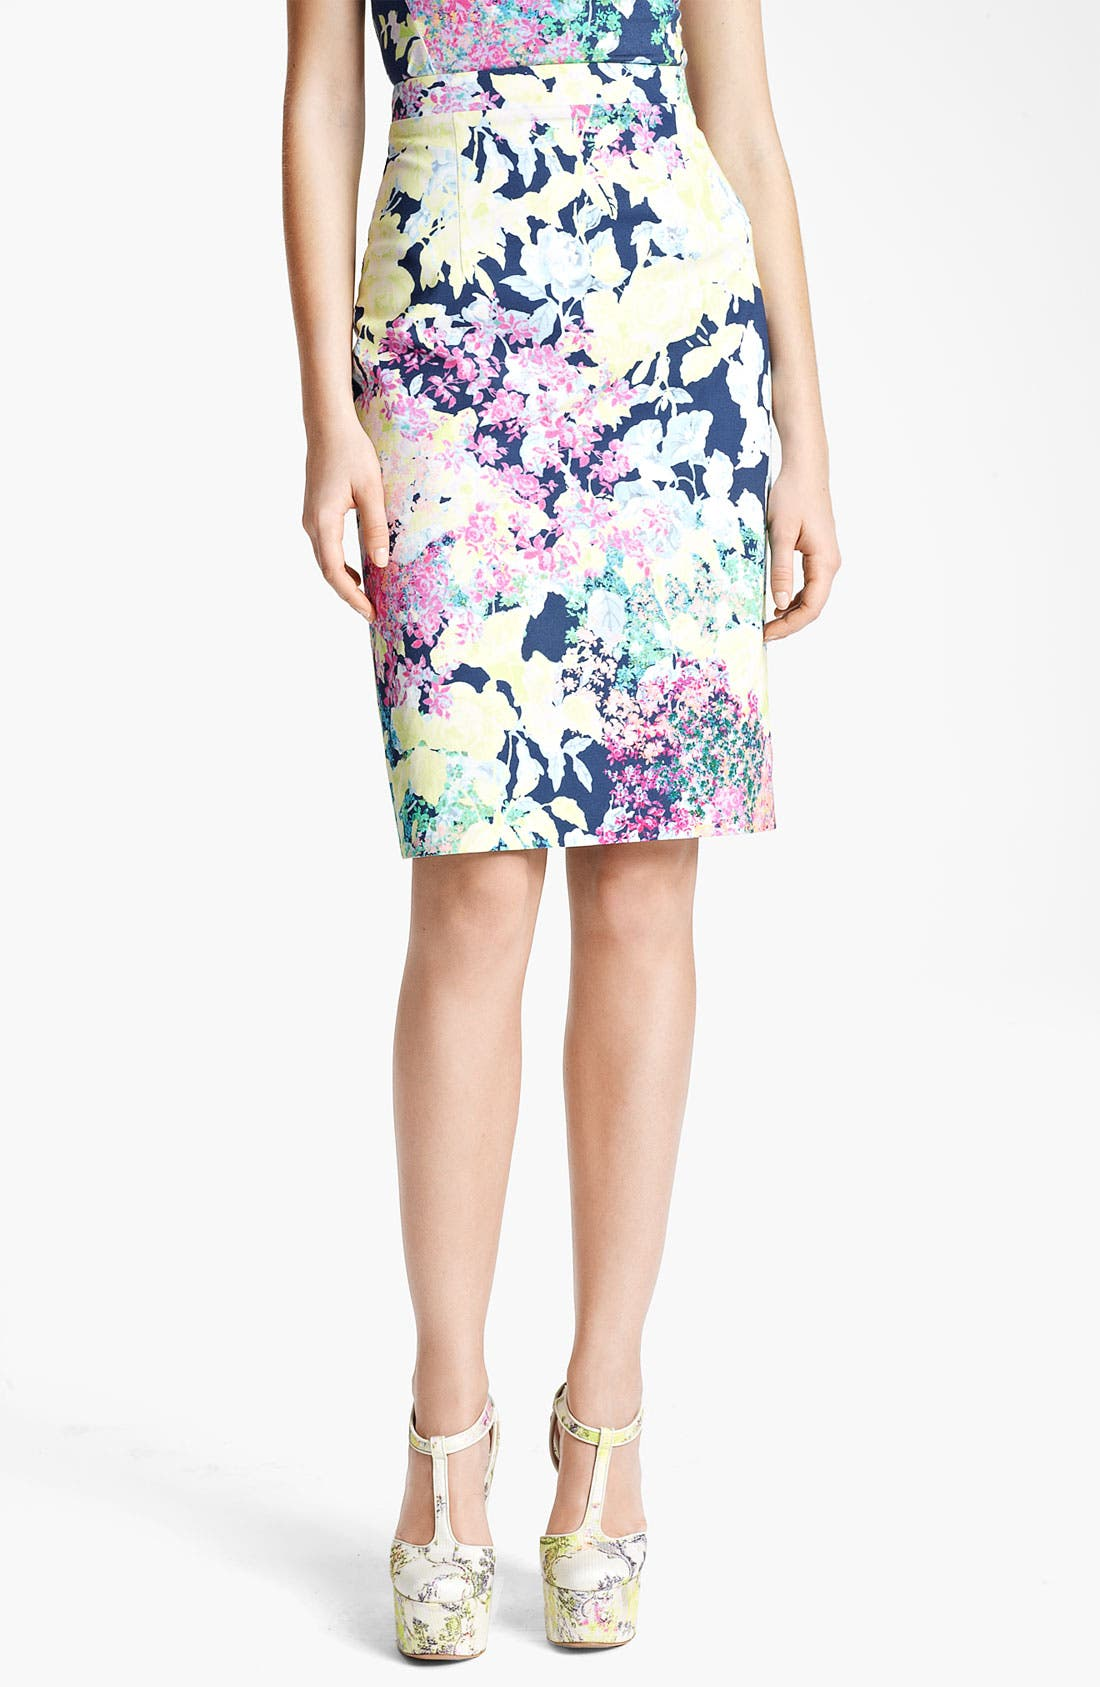 Alternate Image 1 Selected - Erdem 'Imperial Rose' Print Pencil Skirt